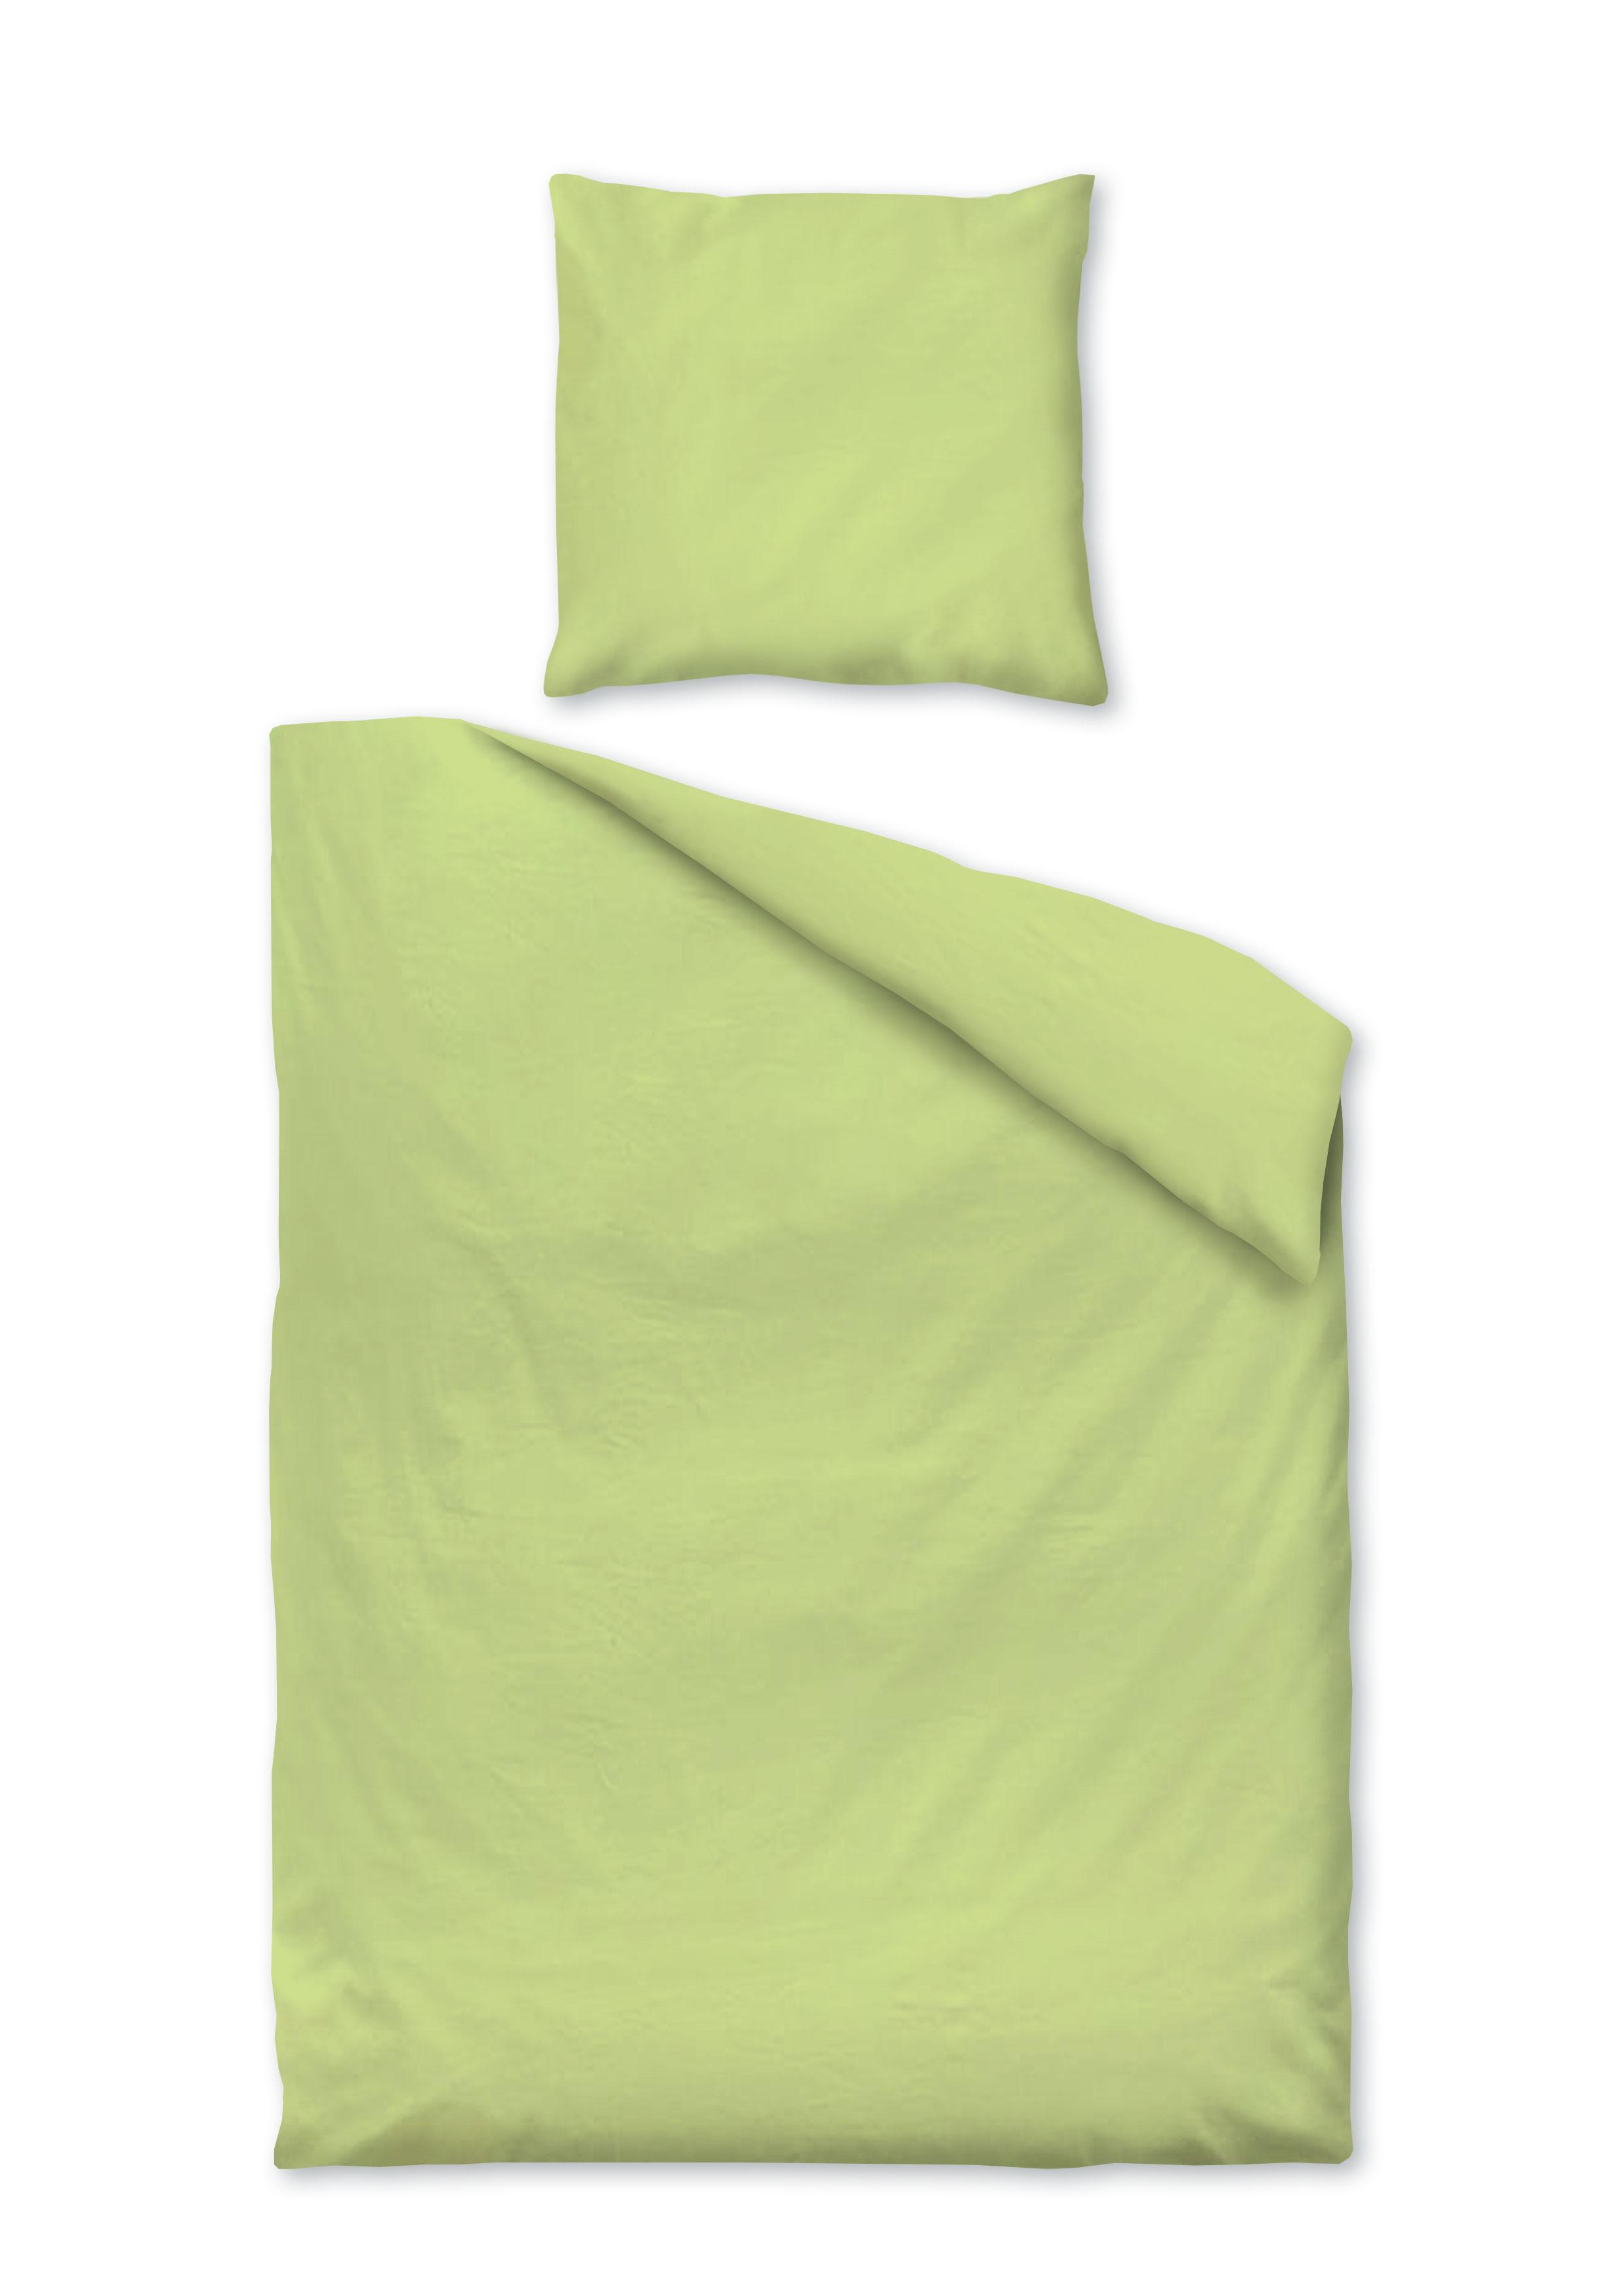 Bettwäsche 135x200|155x220|200x200|200x220|220x240 cm Bettgarnitur Bettbezug NEV